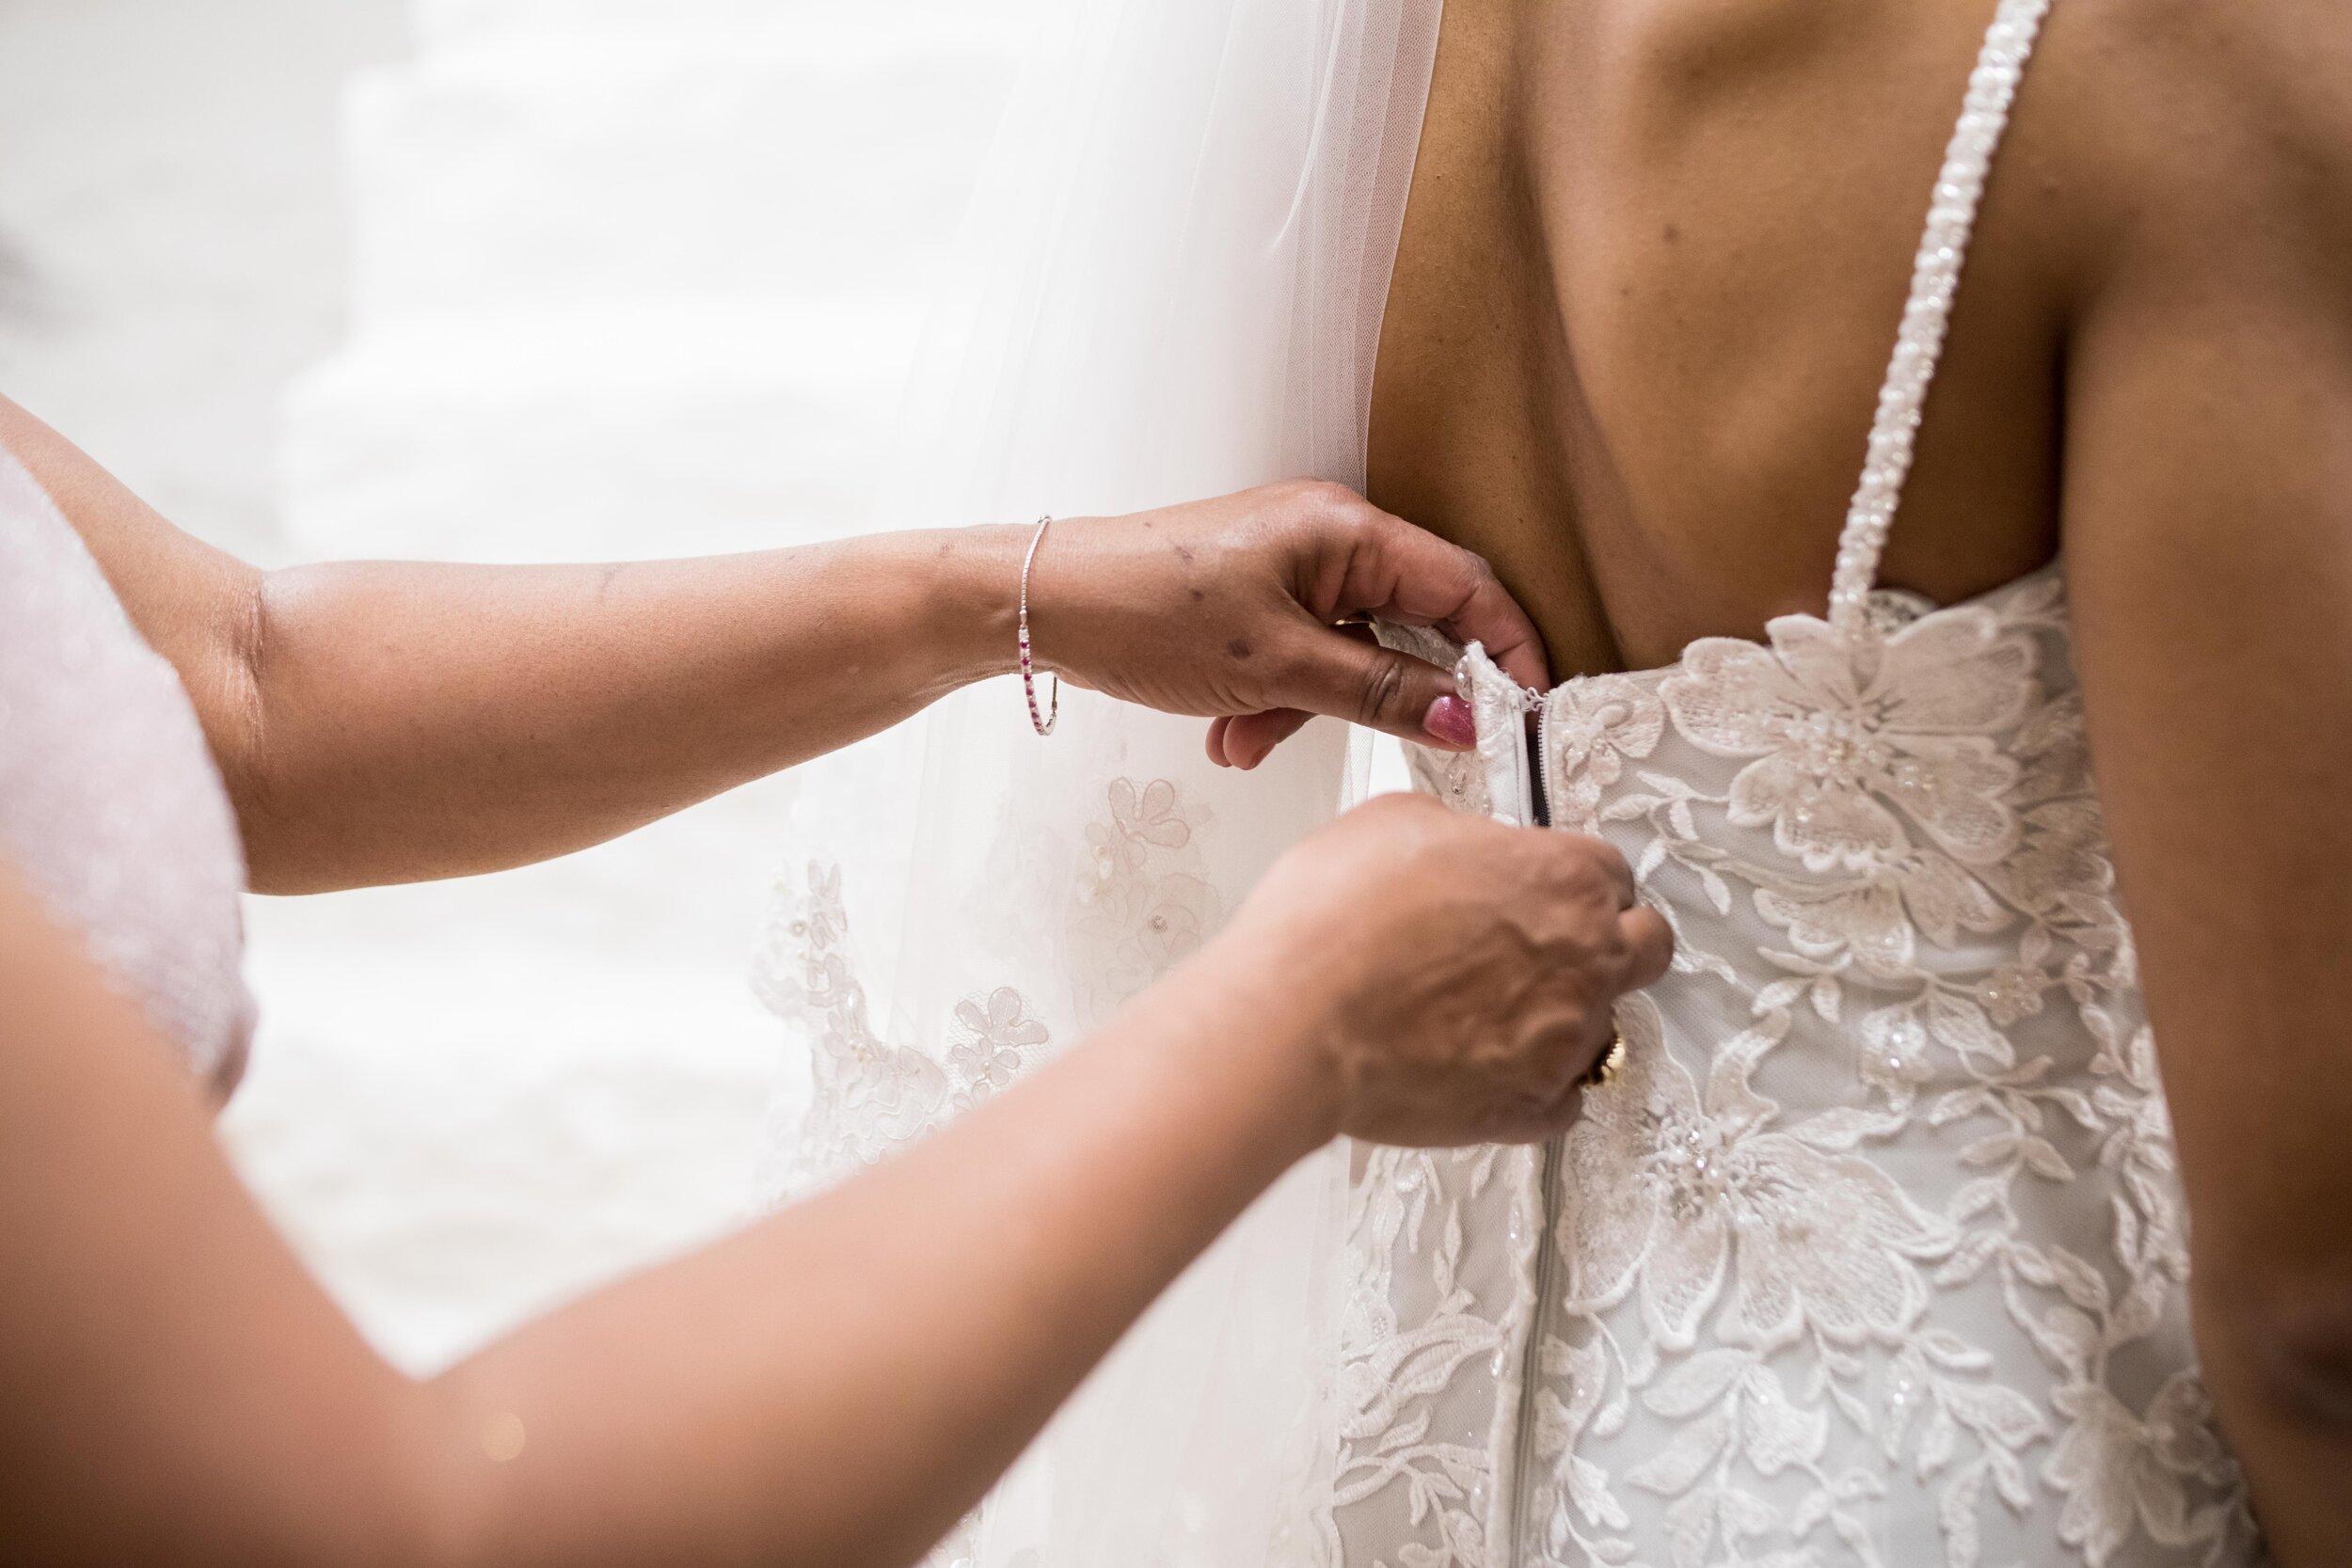 8_3_2019_BONTY_WEDDING-74.jpg